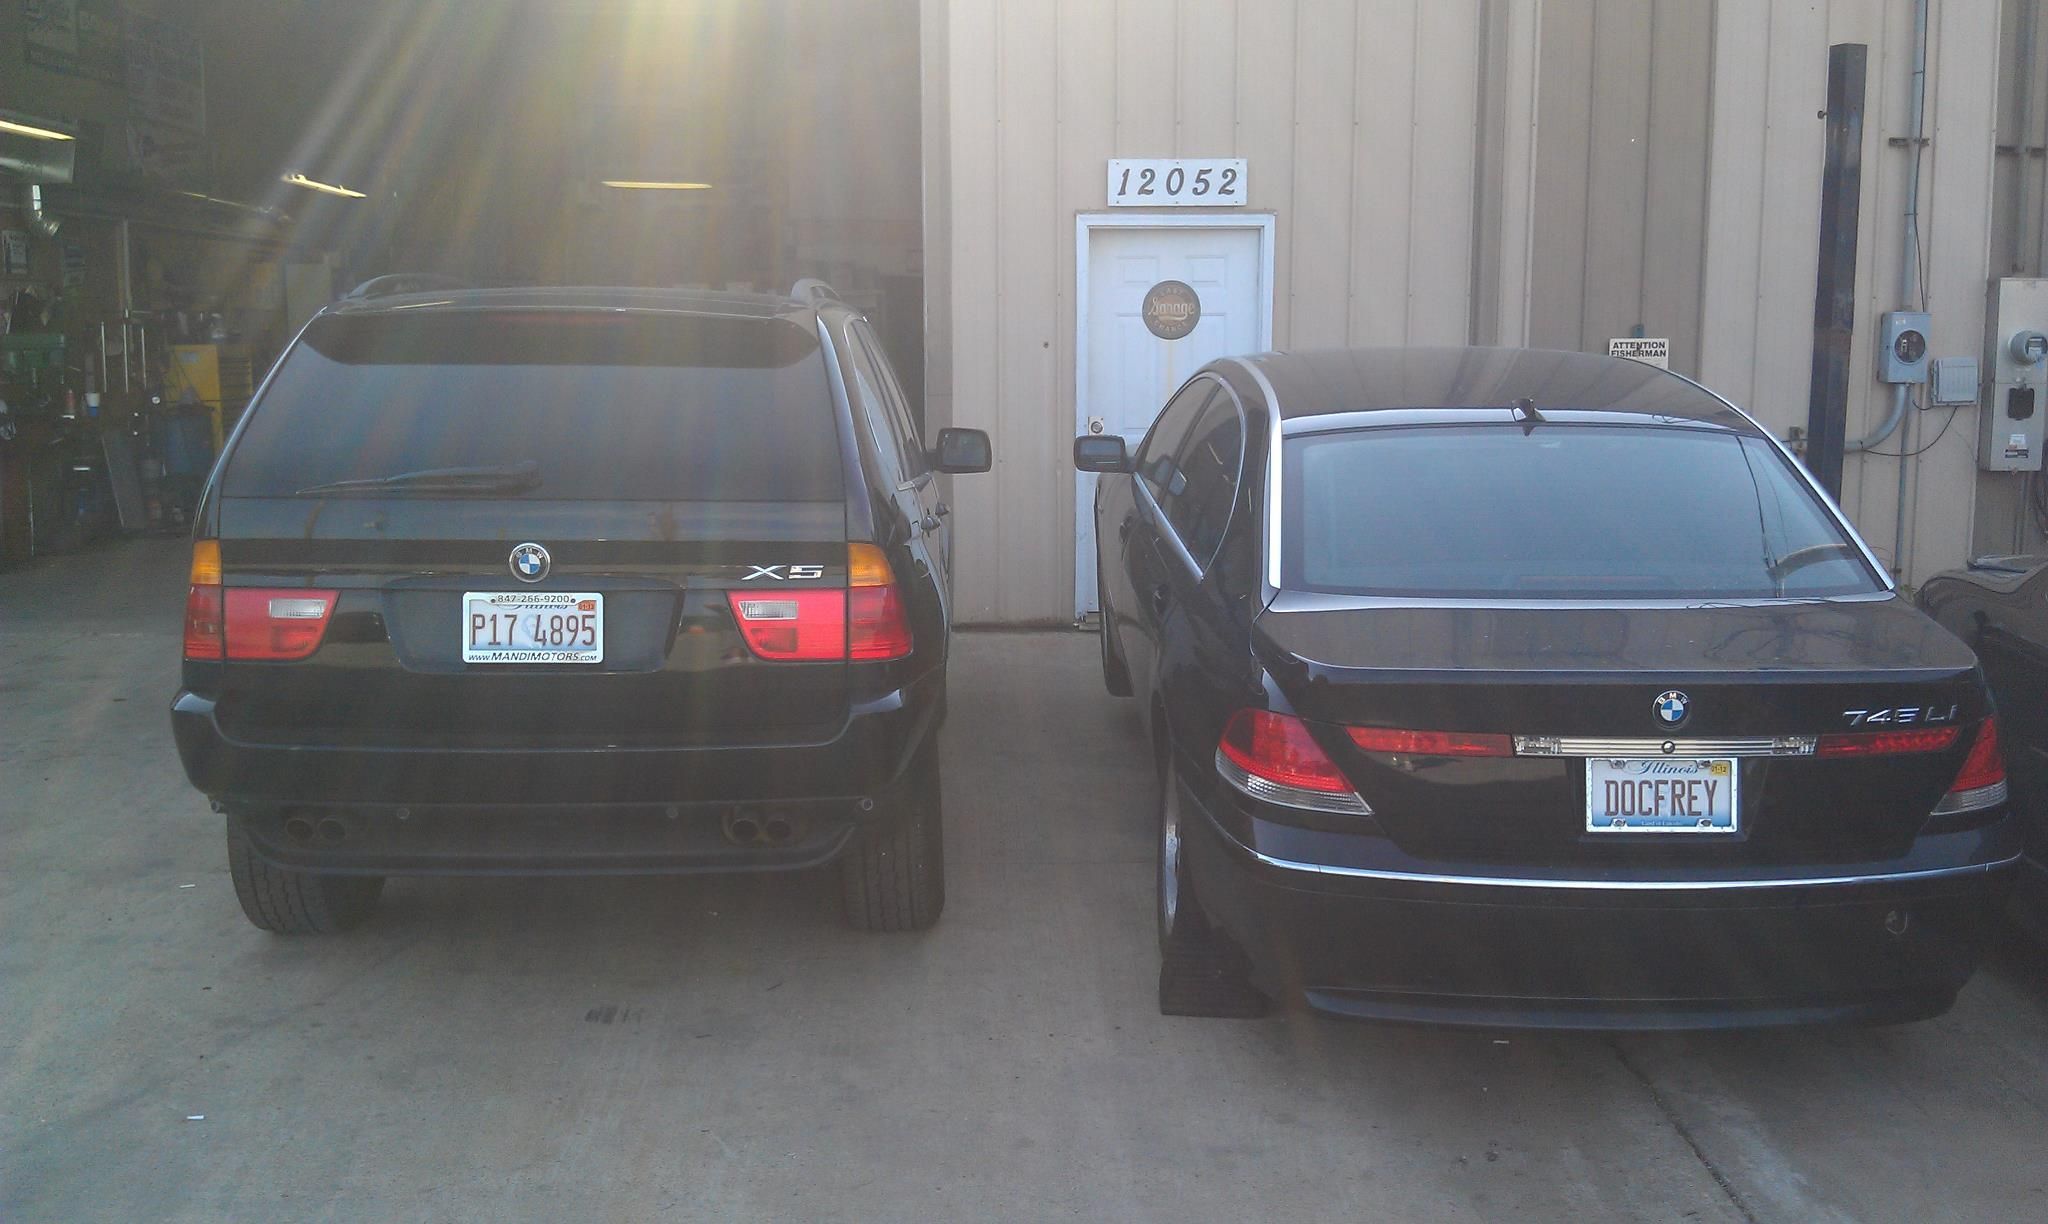 Foreign automotive repair shop in Plainfield, Illinois